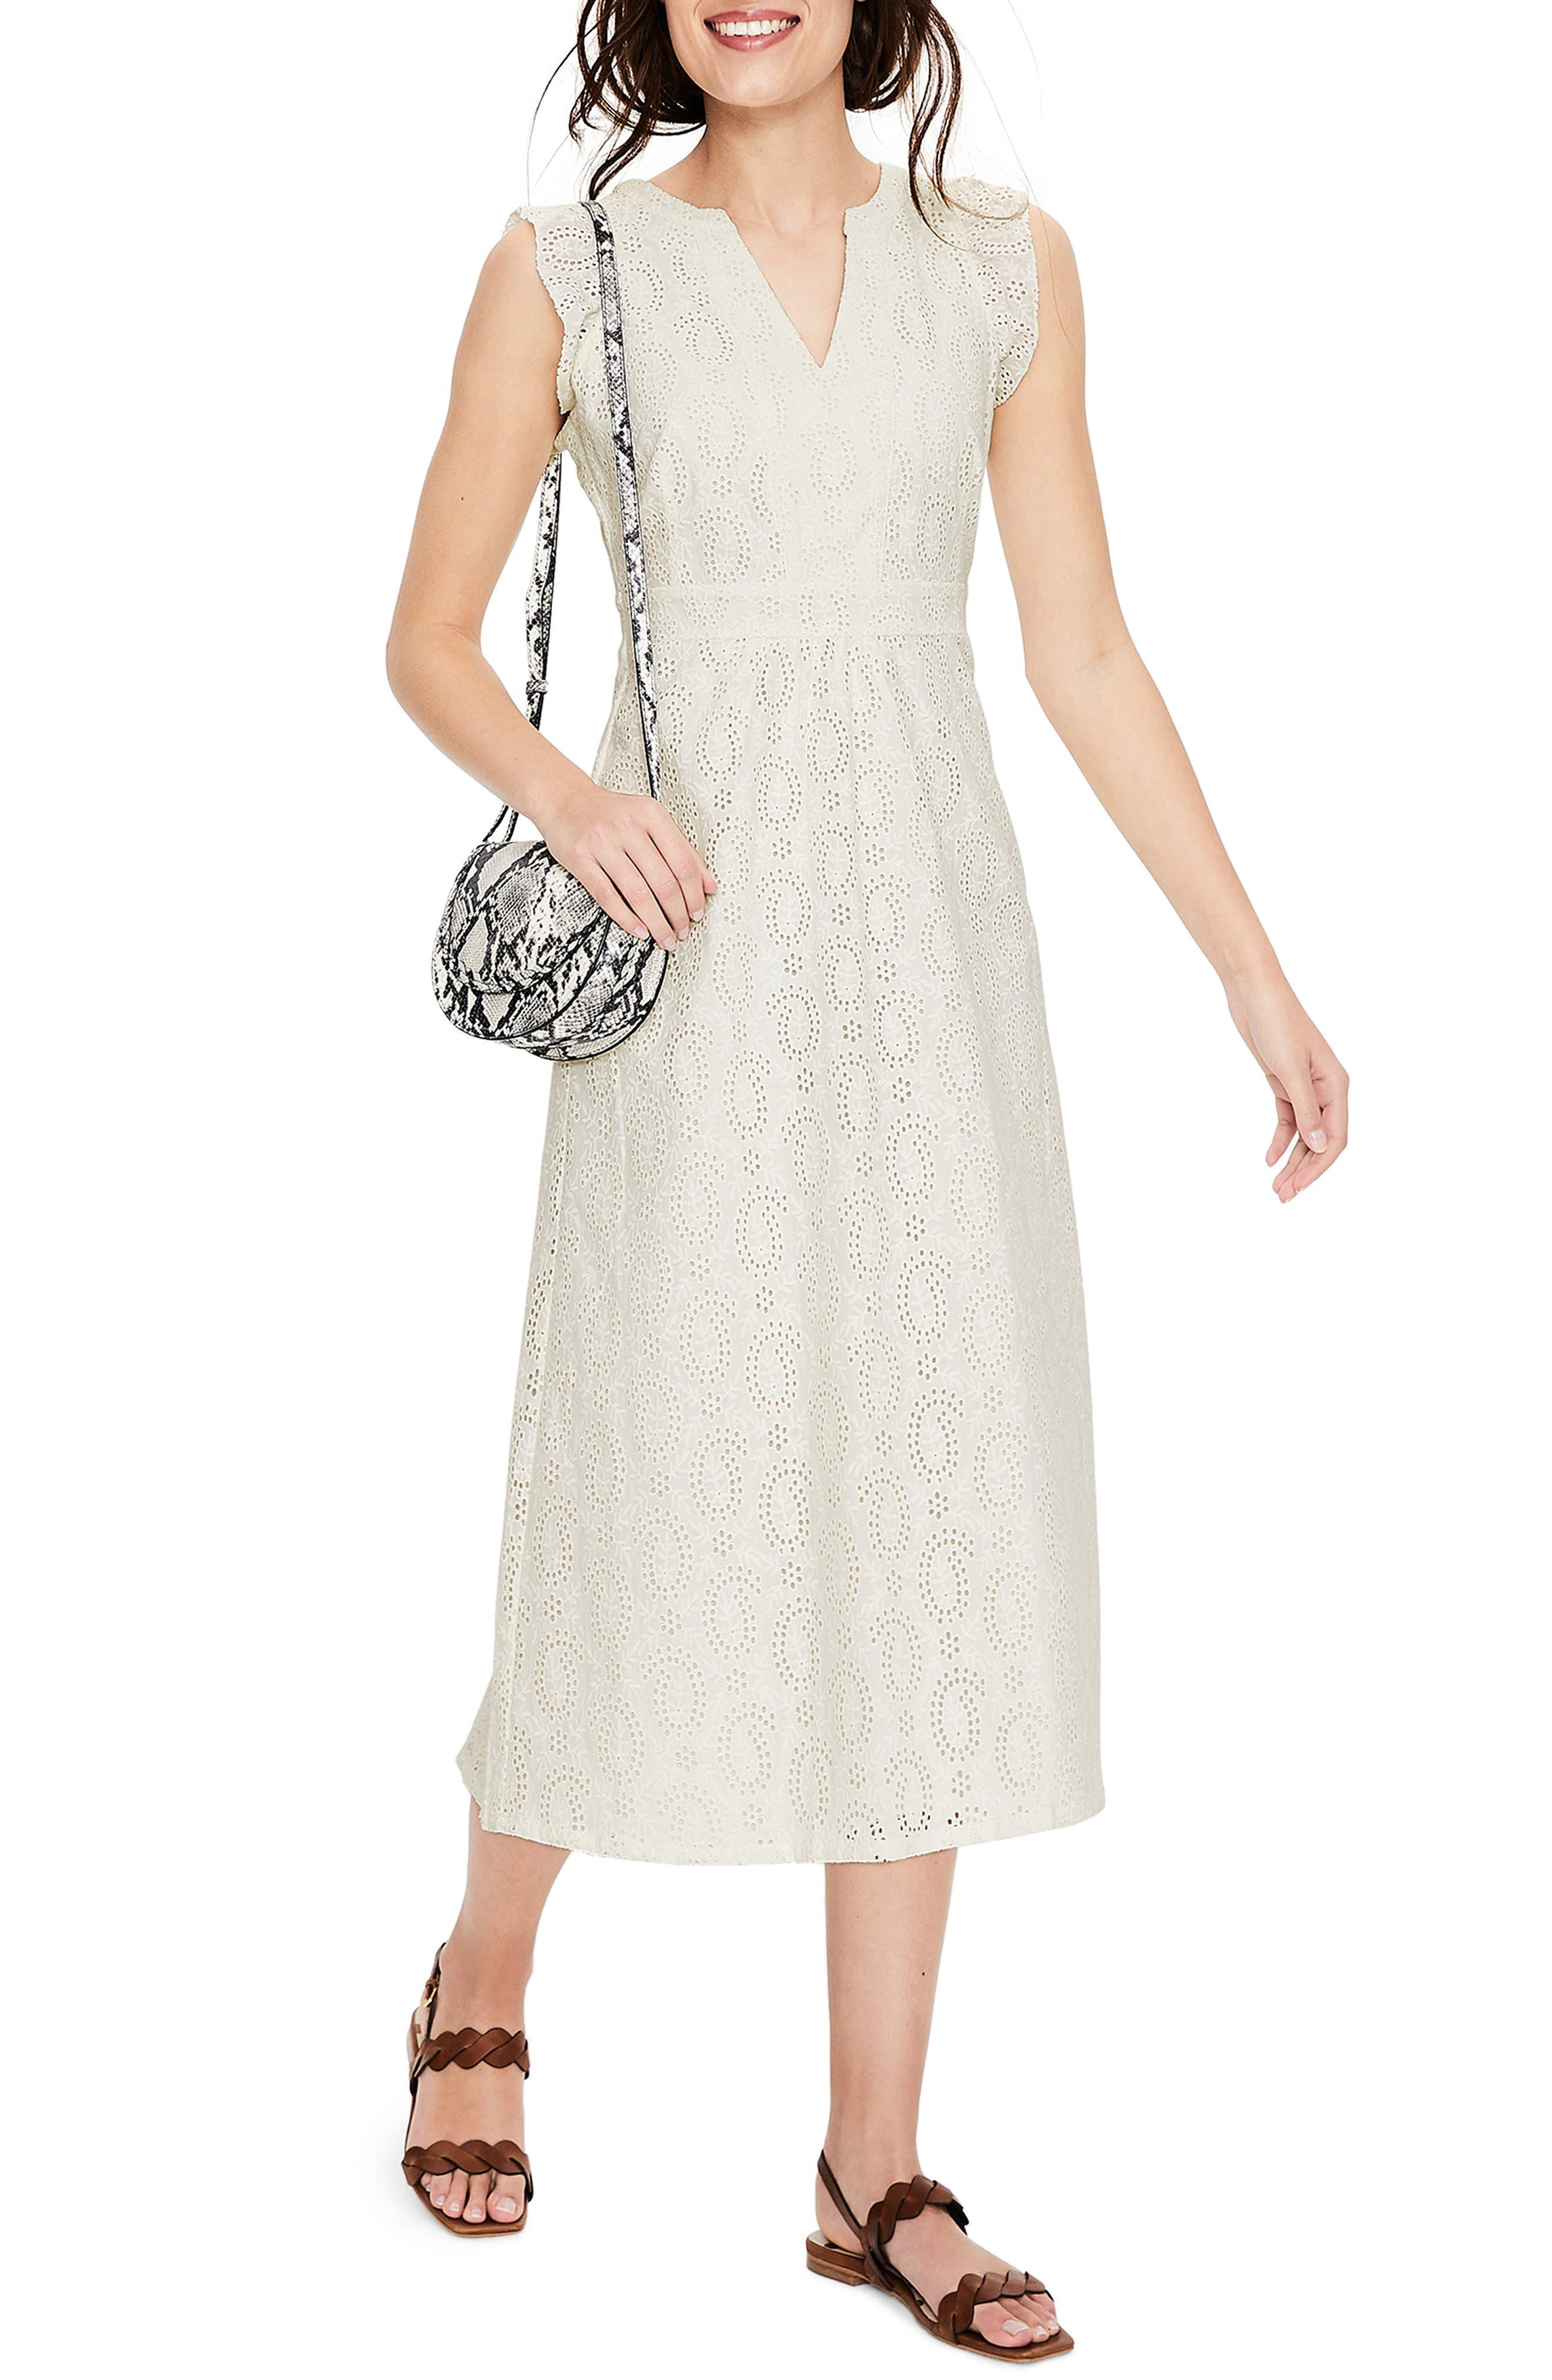 Petite Boden Hallie Broderie Lace Midi Dress, White